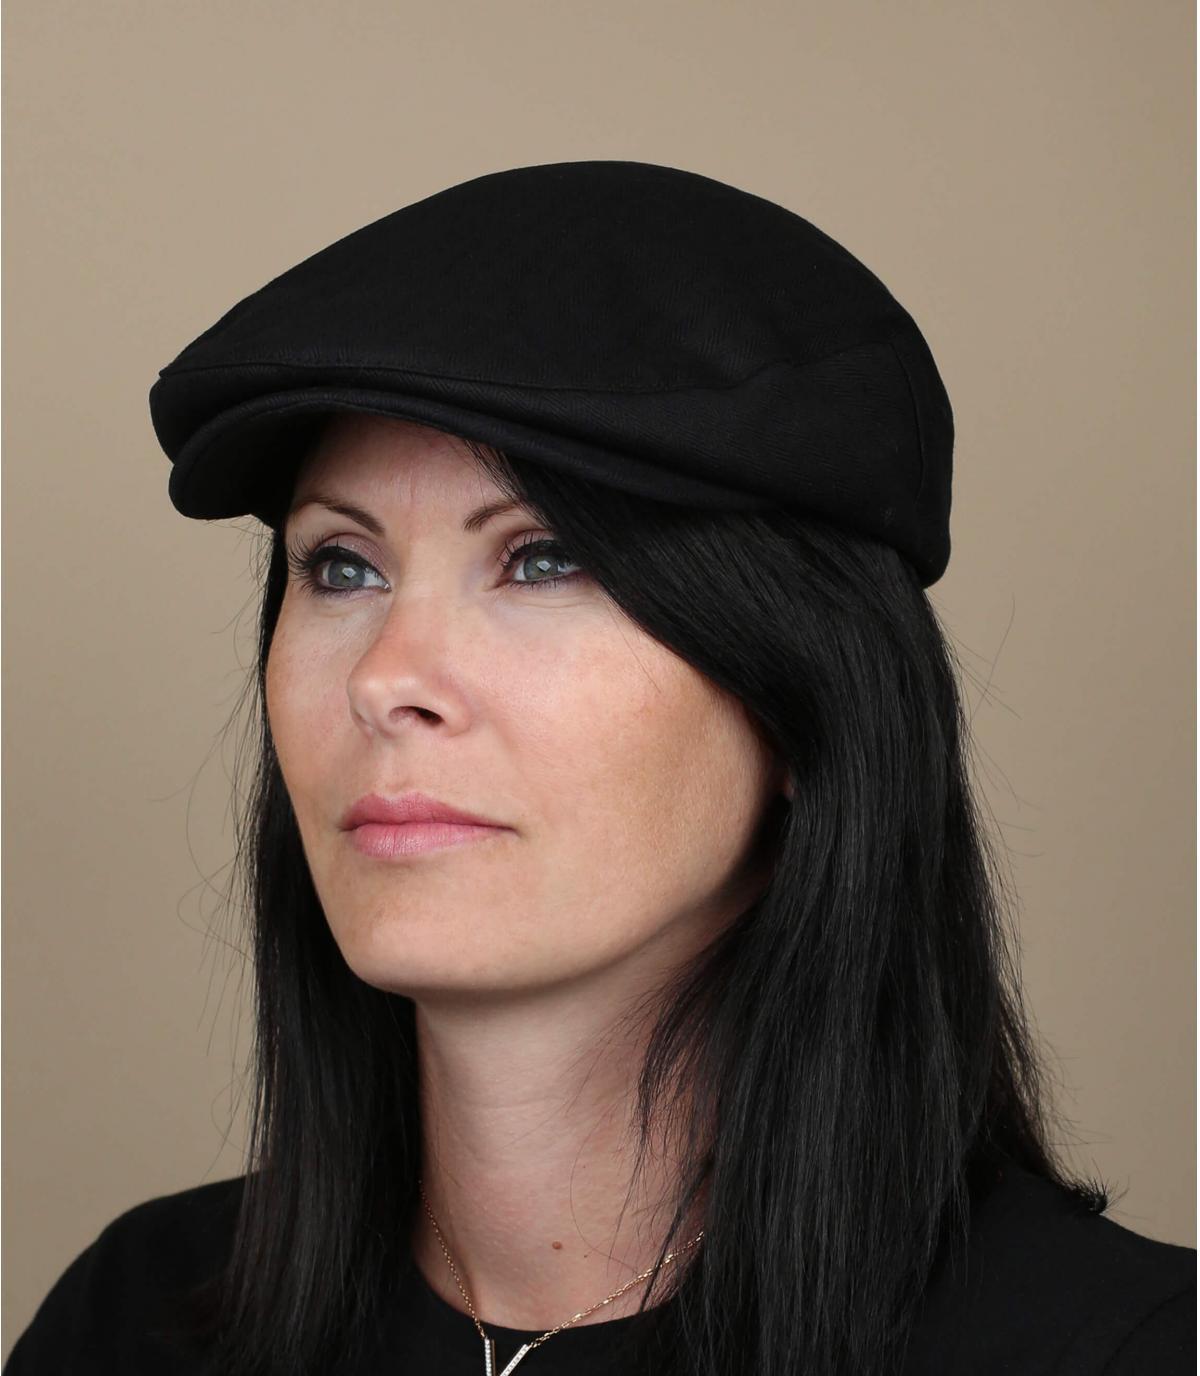 Damen Barett in Schwarz